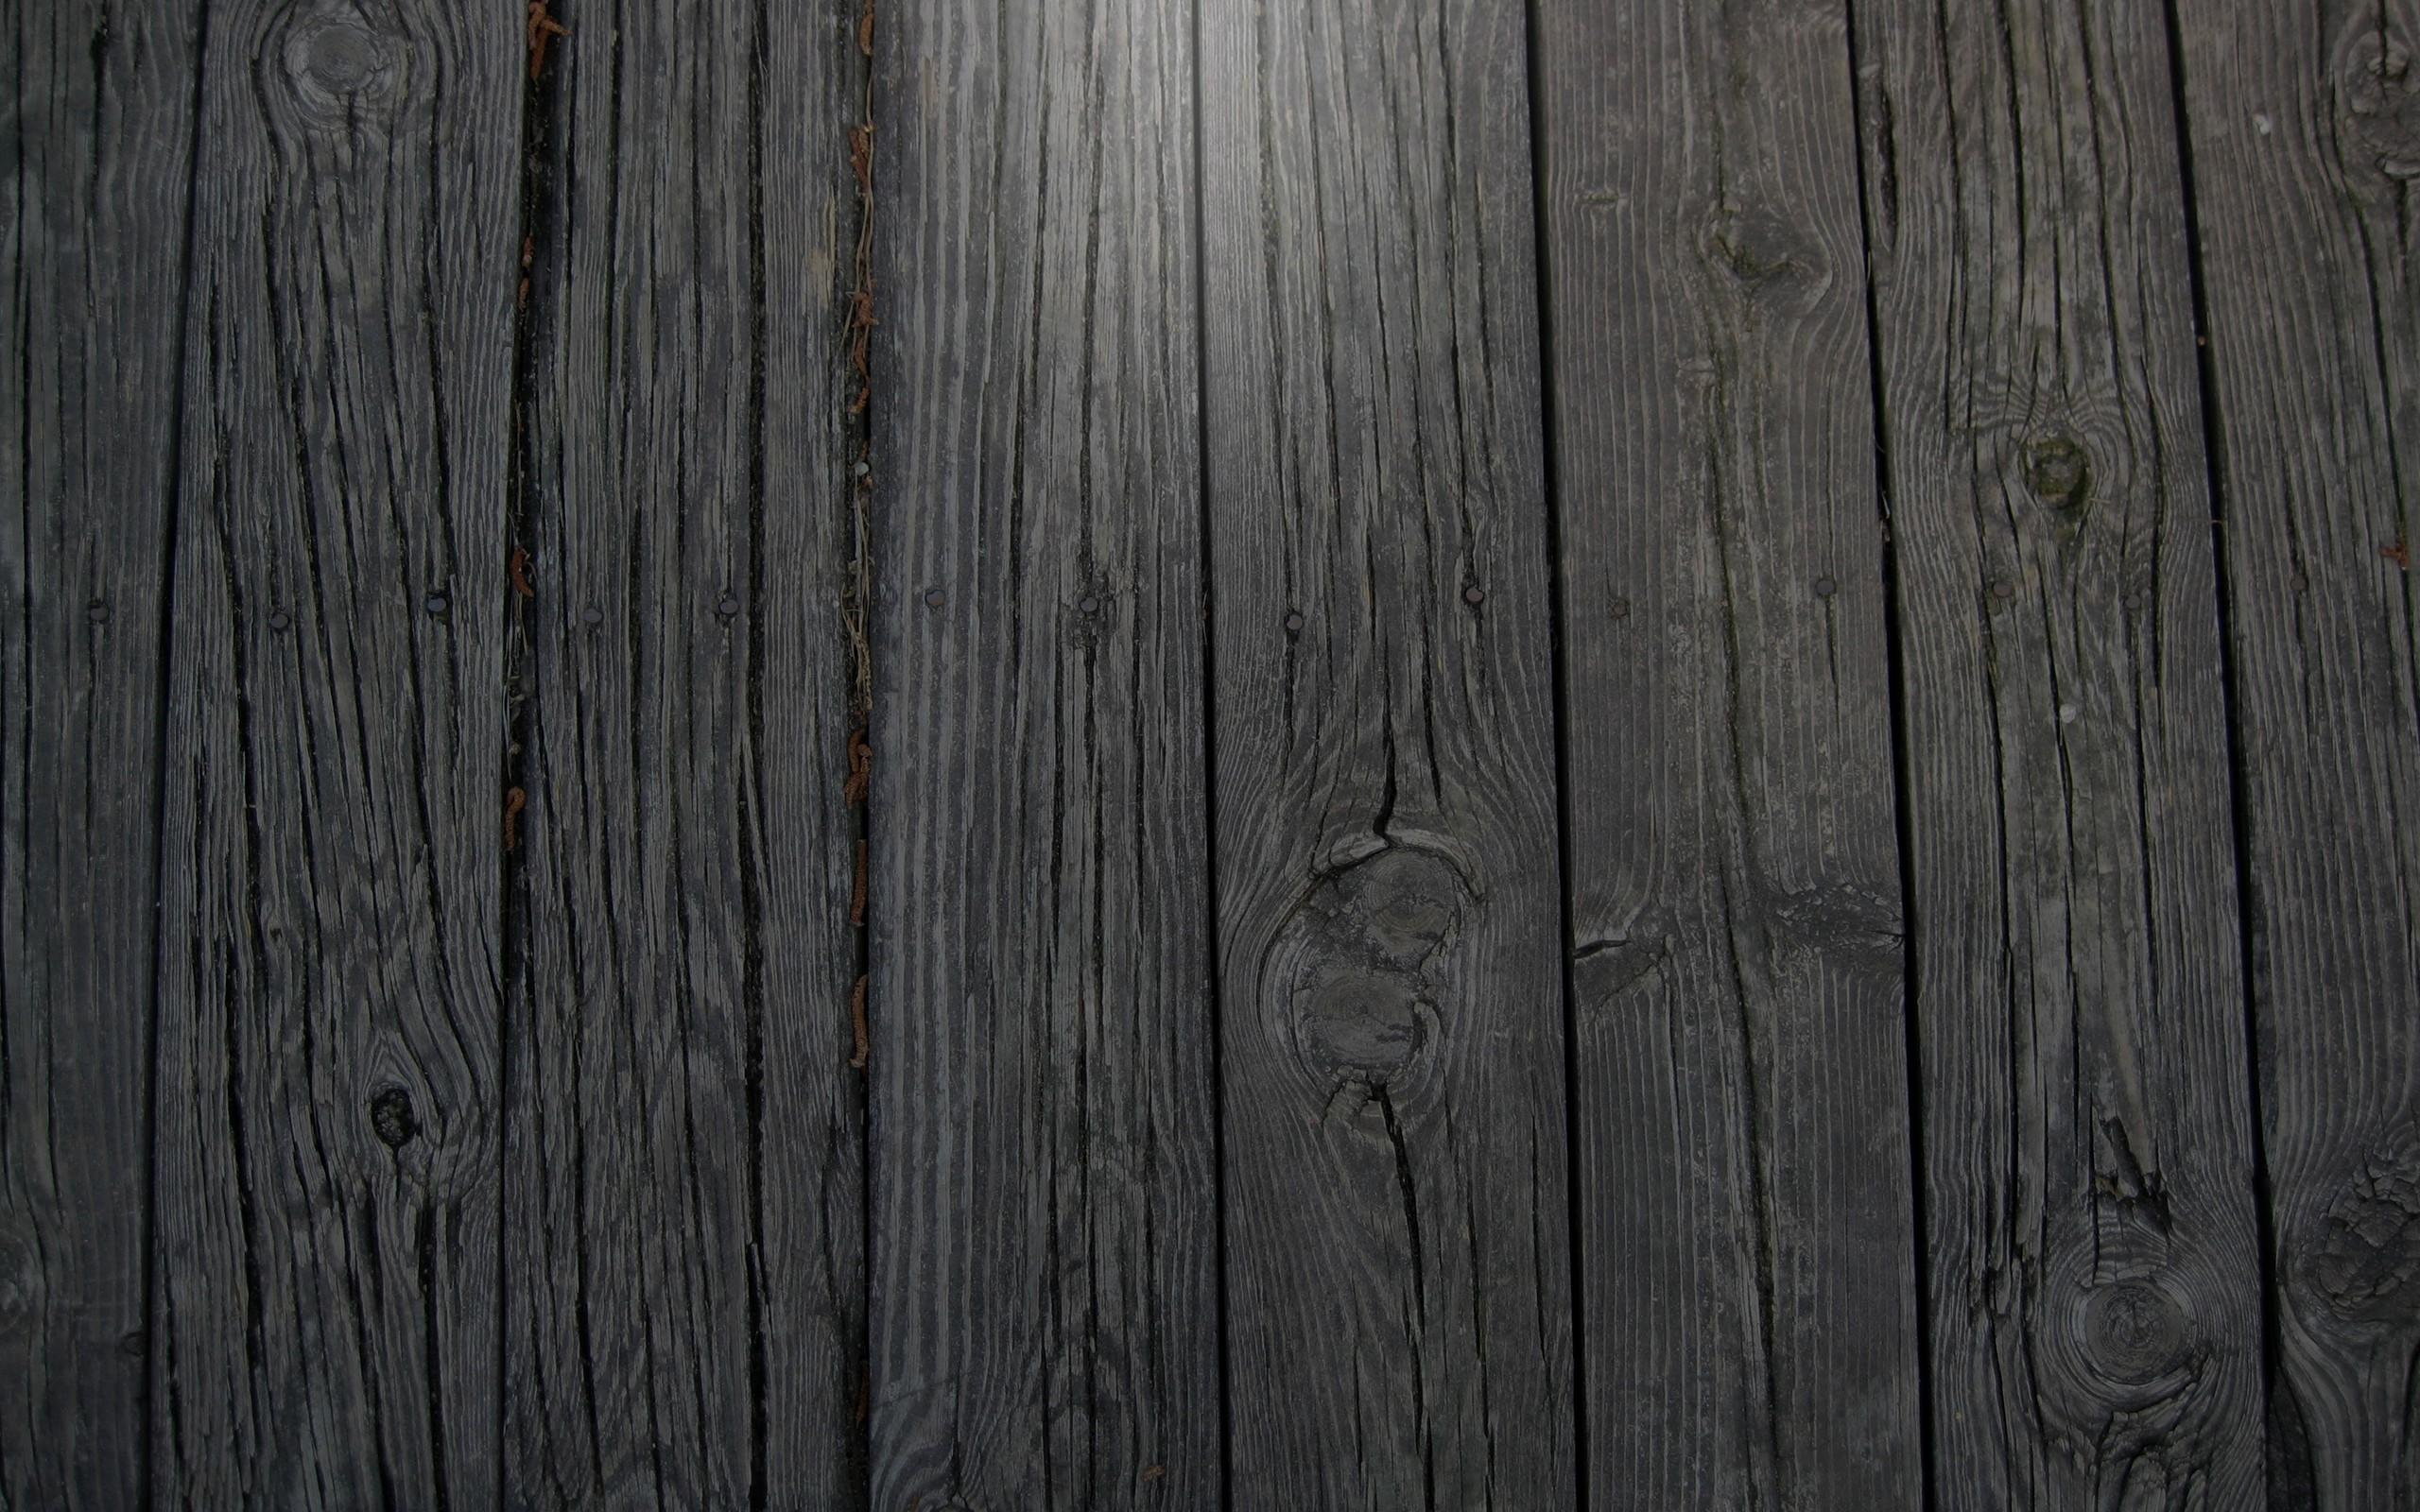 ... wood wallpaper 5 ...